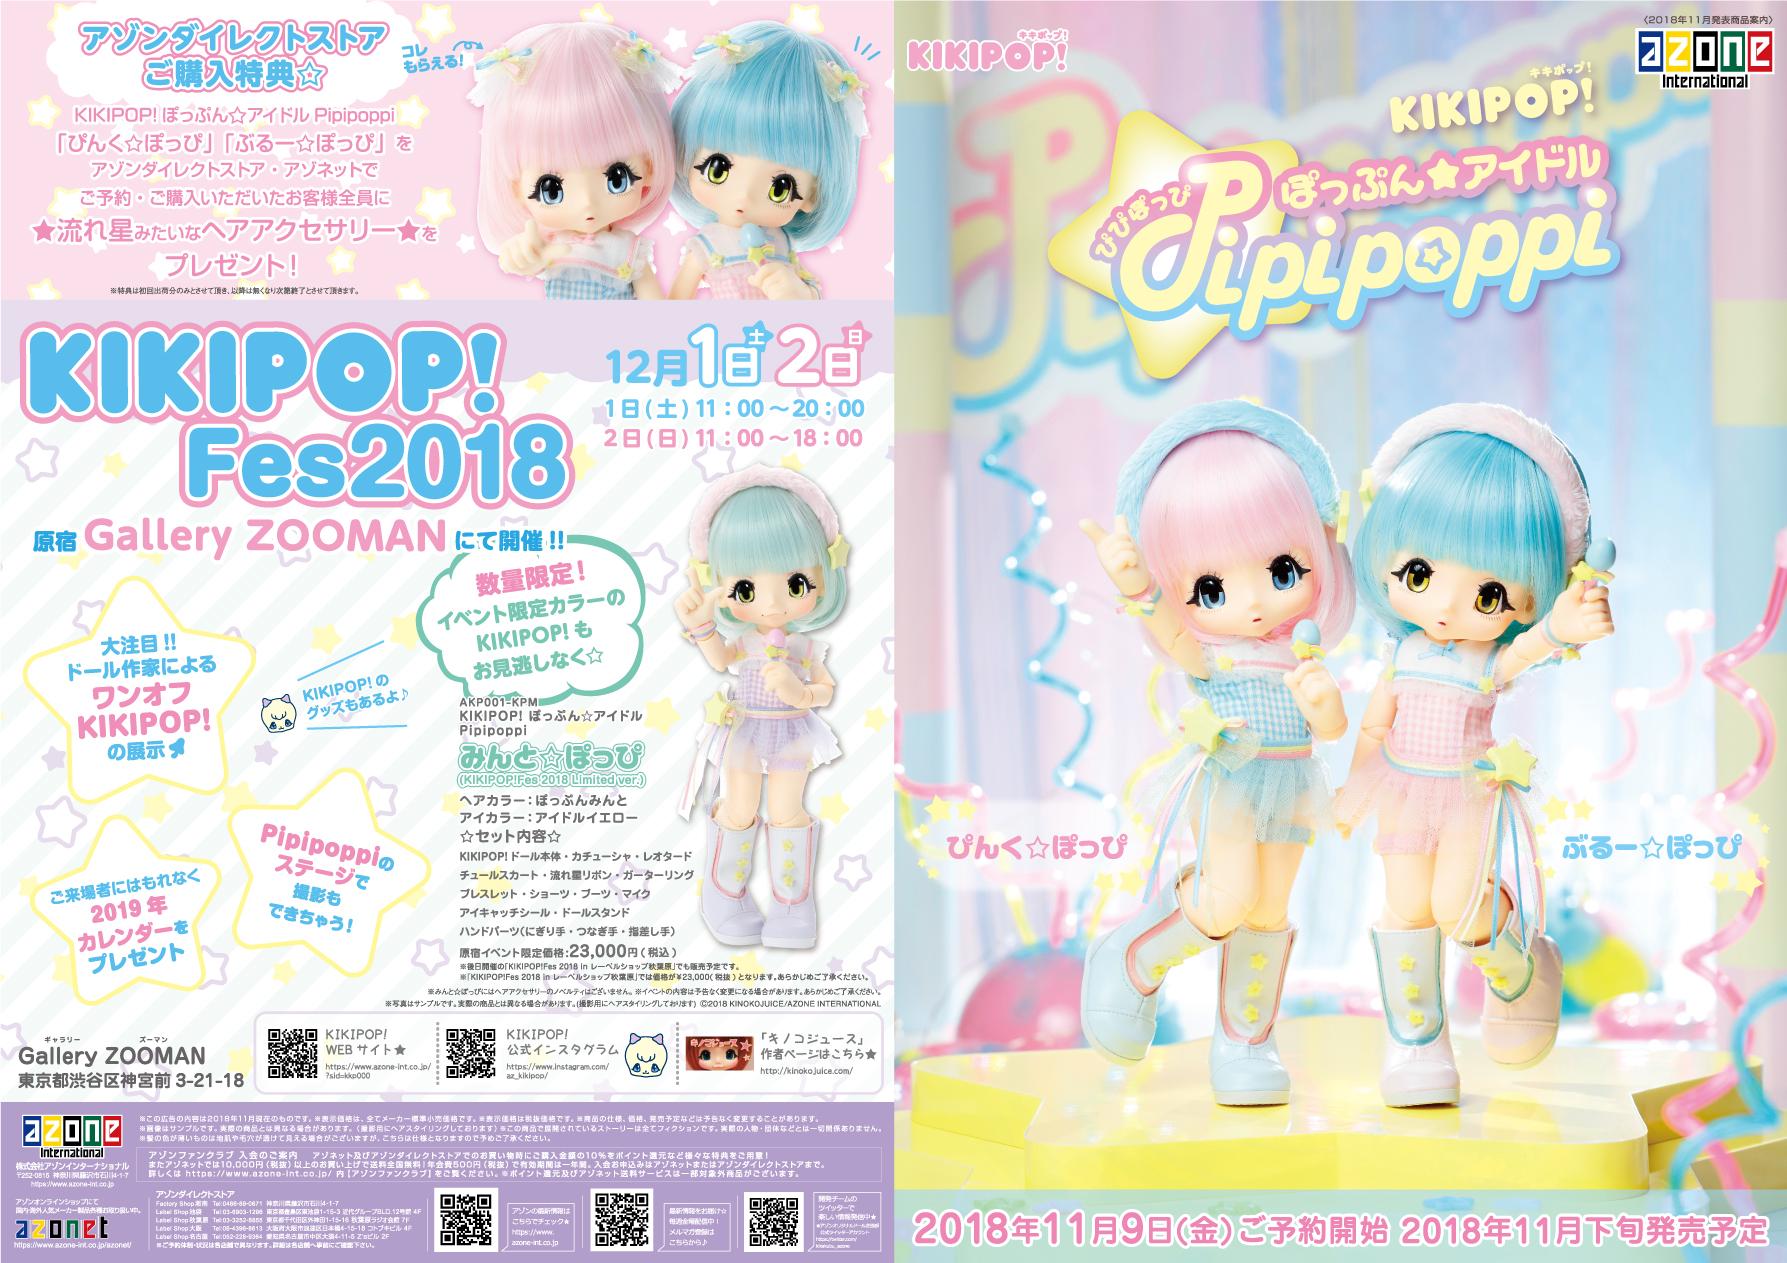 KIKIPOP! ぽっぷん☆アイドル Pipipoppi